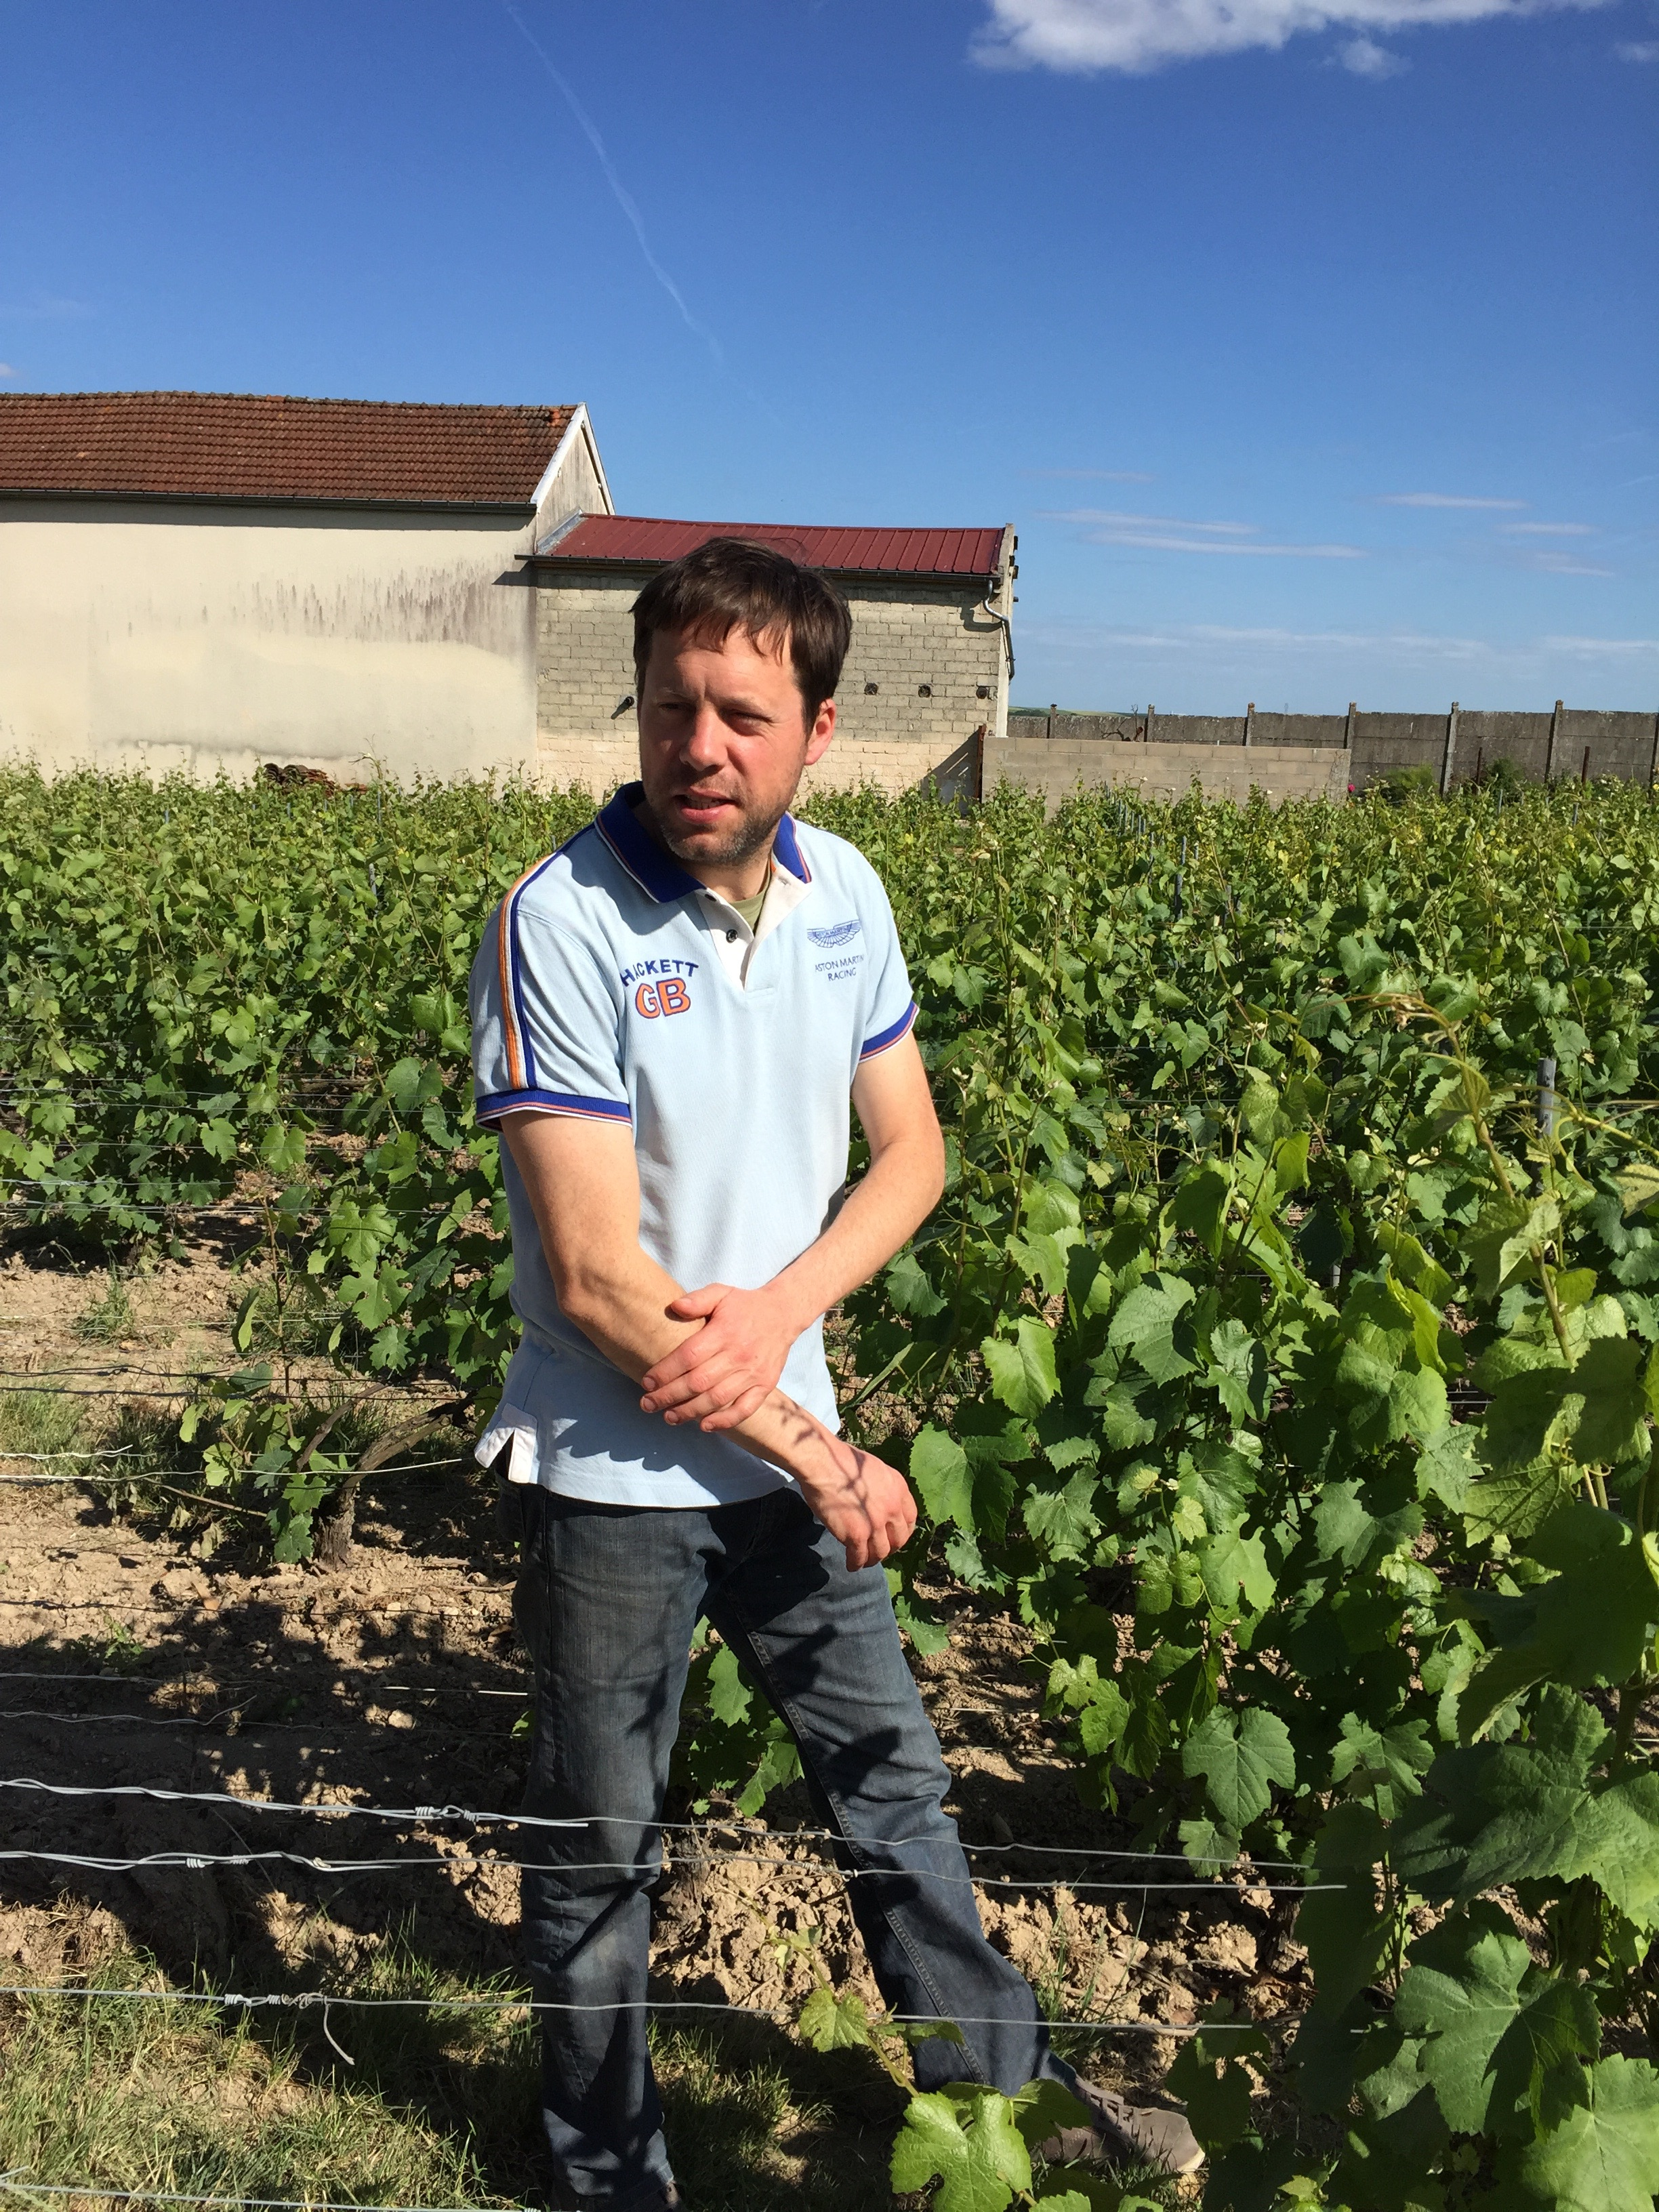 Benîot in the vines